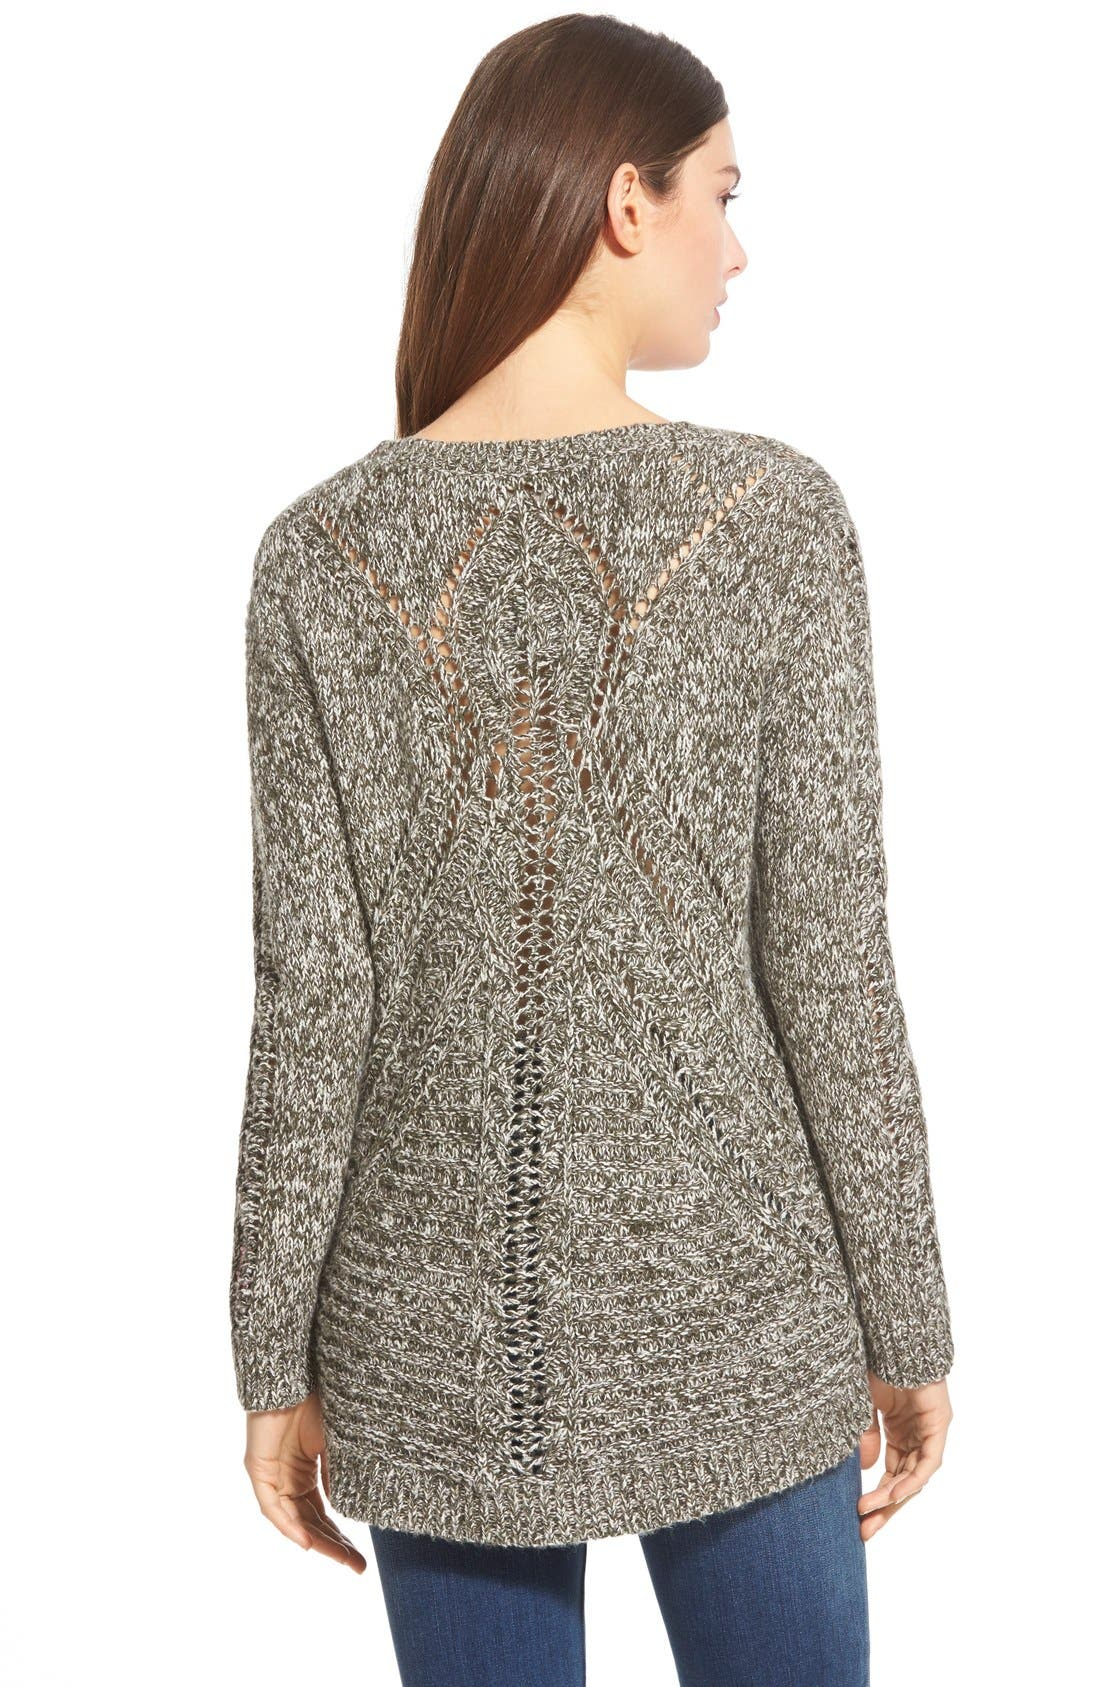 Back Detail Sweater,                             Alternate thumbnail 3, color,                             300